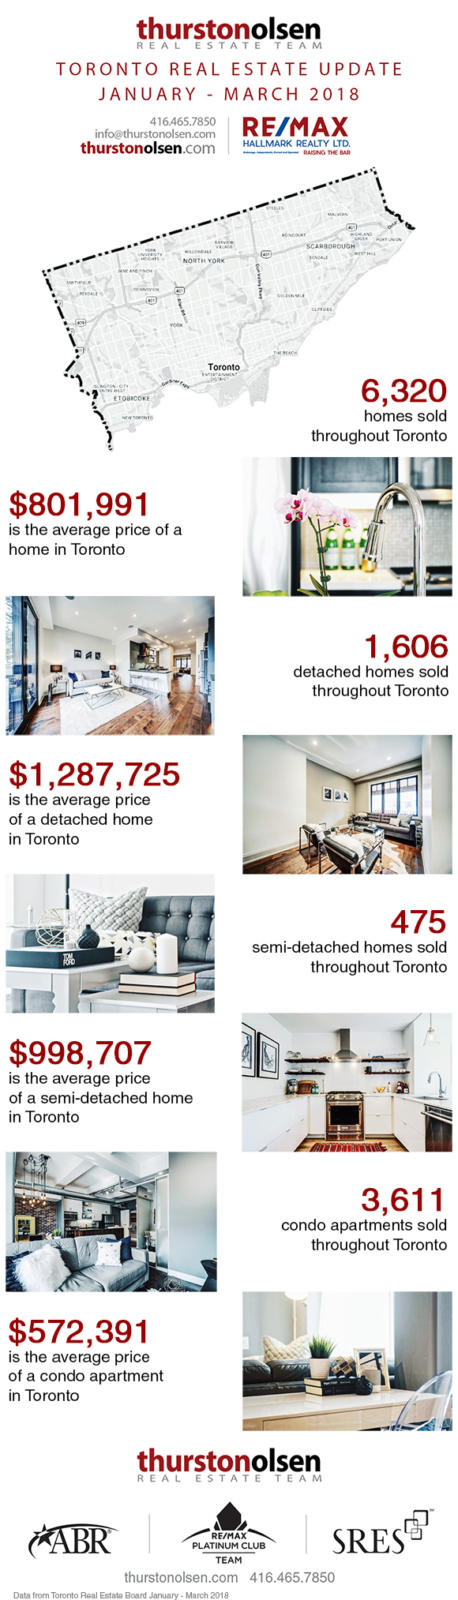 Thurston Olsen Team Toronto Real Estate Update January - March 2018 Q1